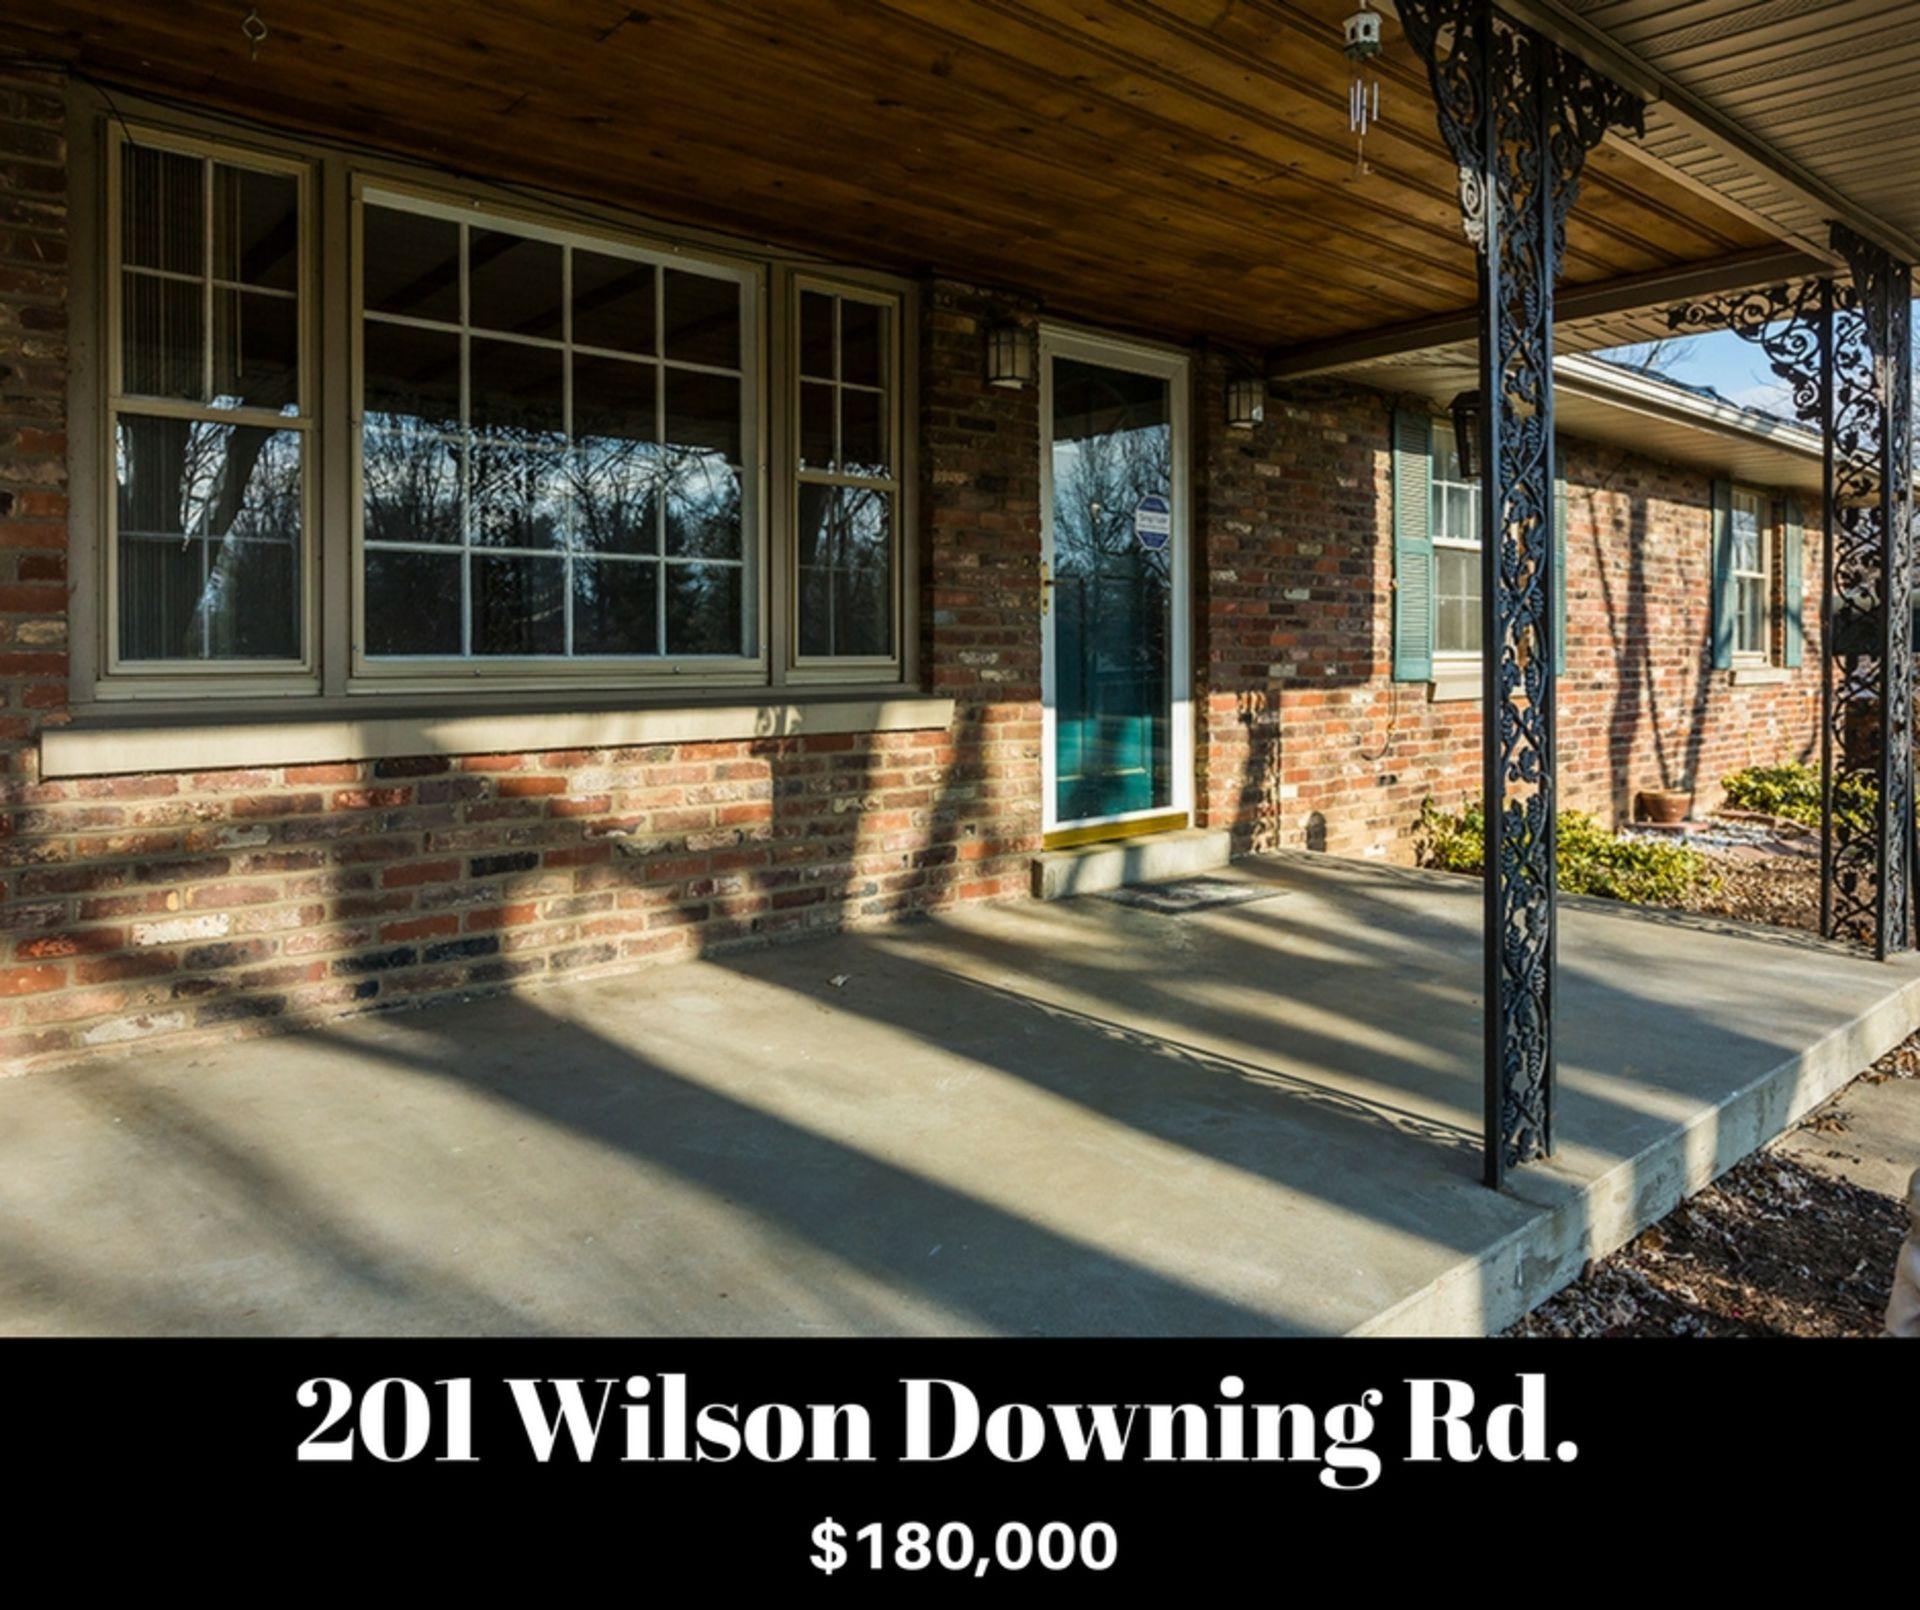 FOR SALE! – 201 Wilson Downing Rd. Lexington, KY 40517